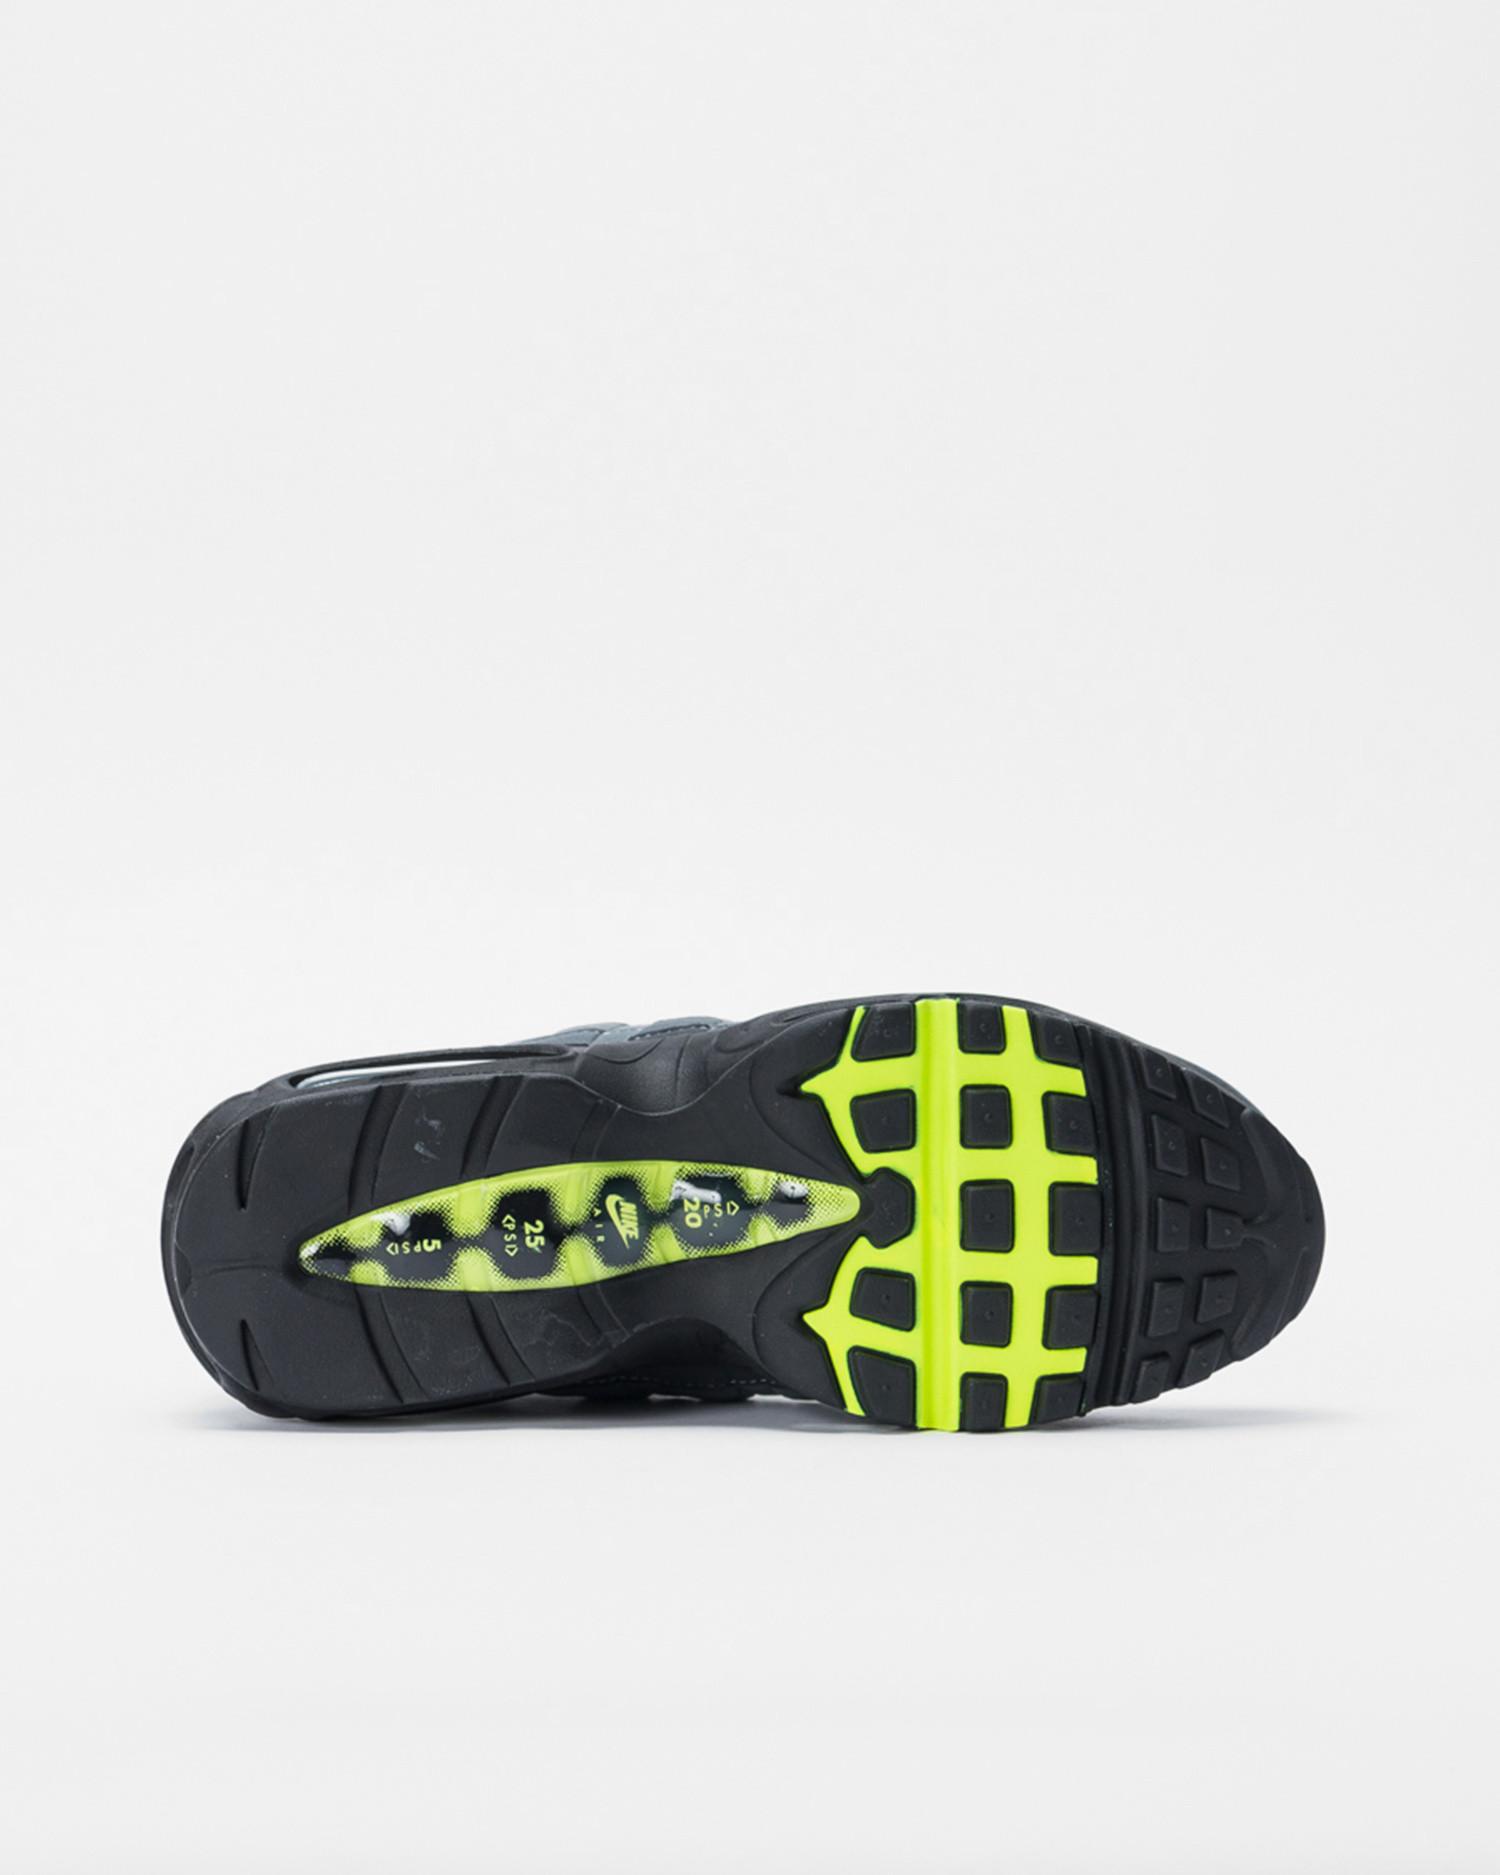 Nike Air Max 95 OG Black/neon yellow-lt graphite